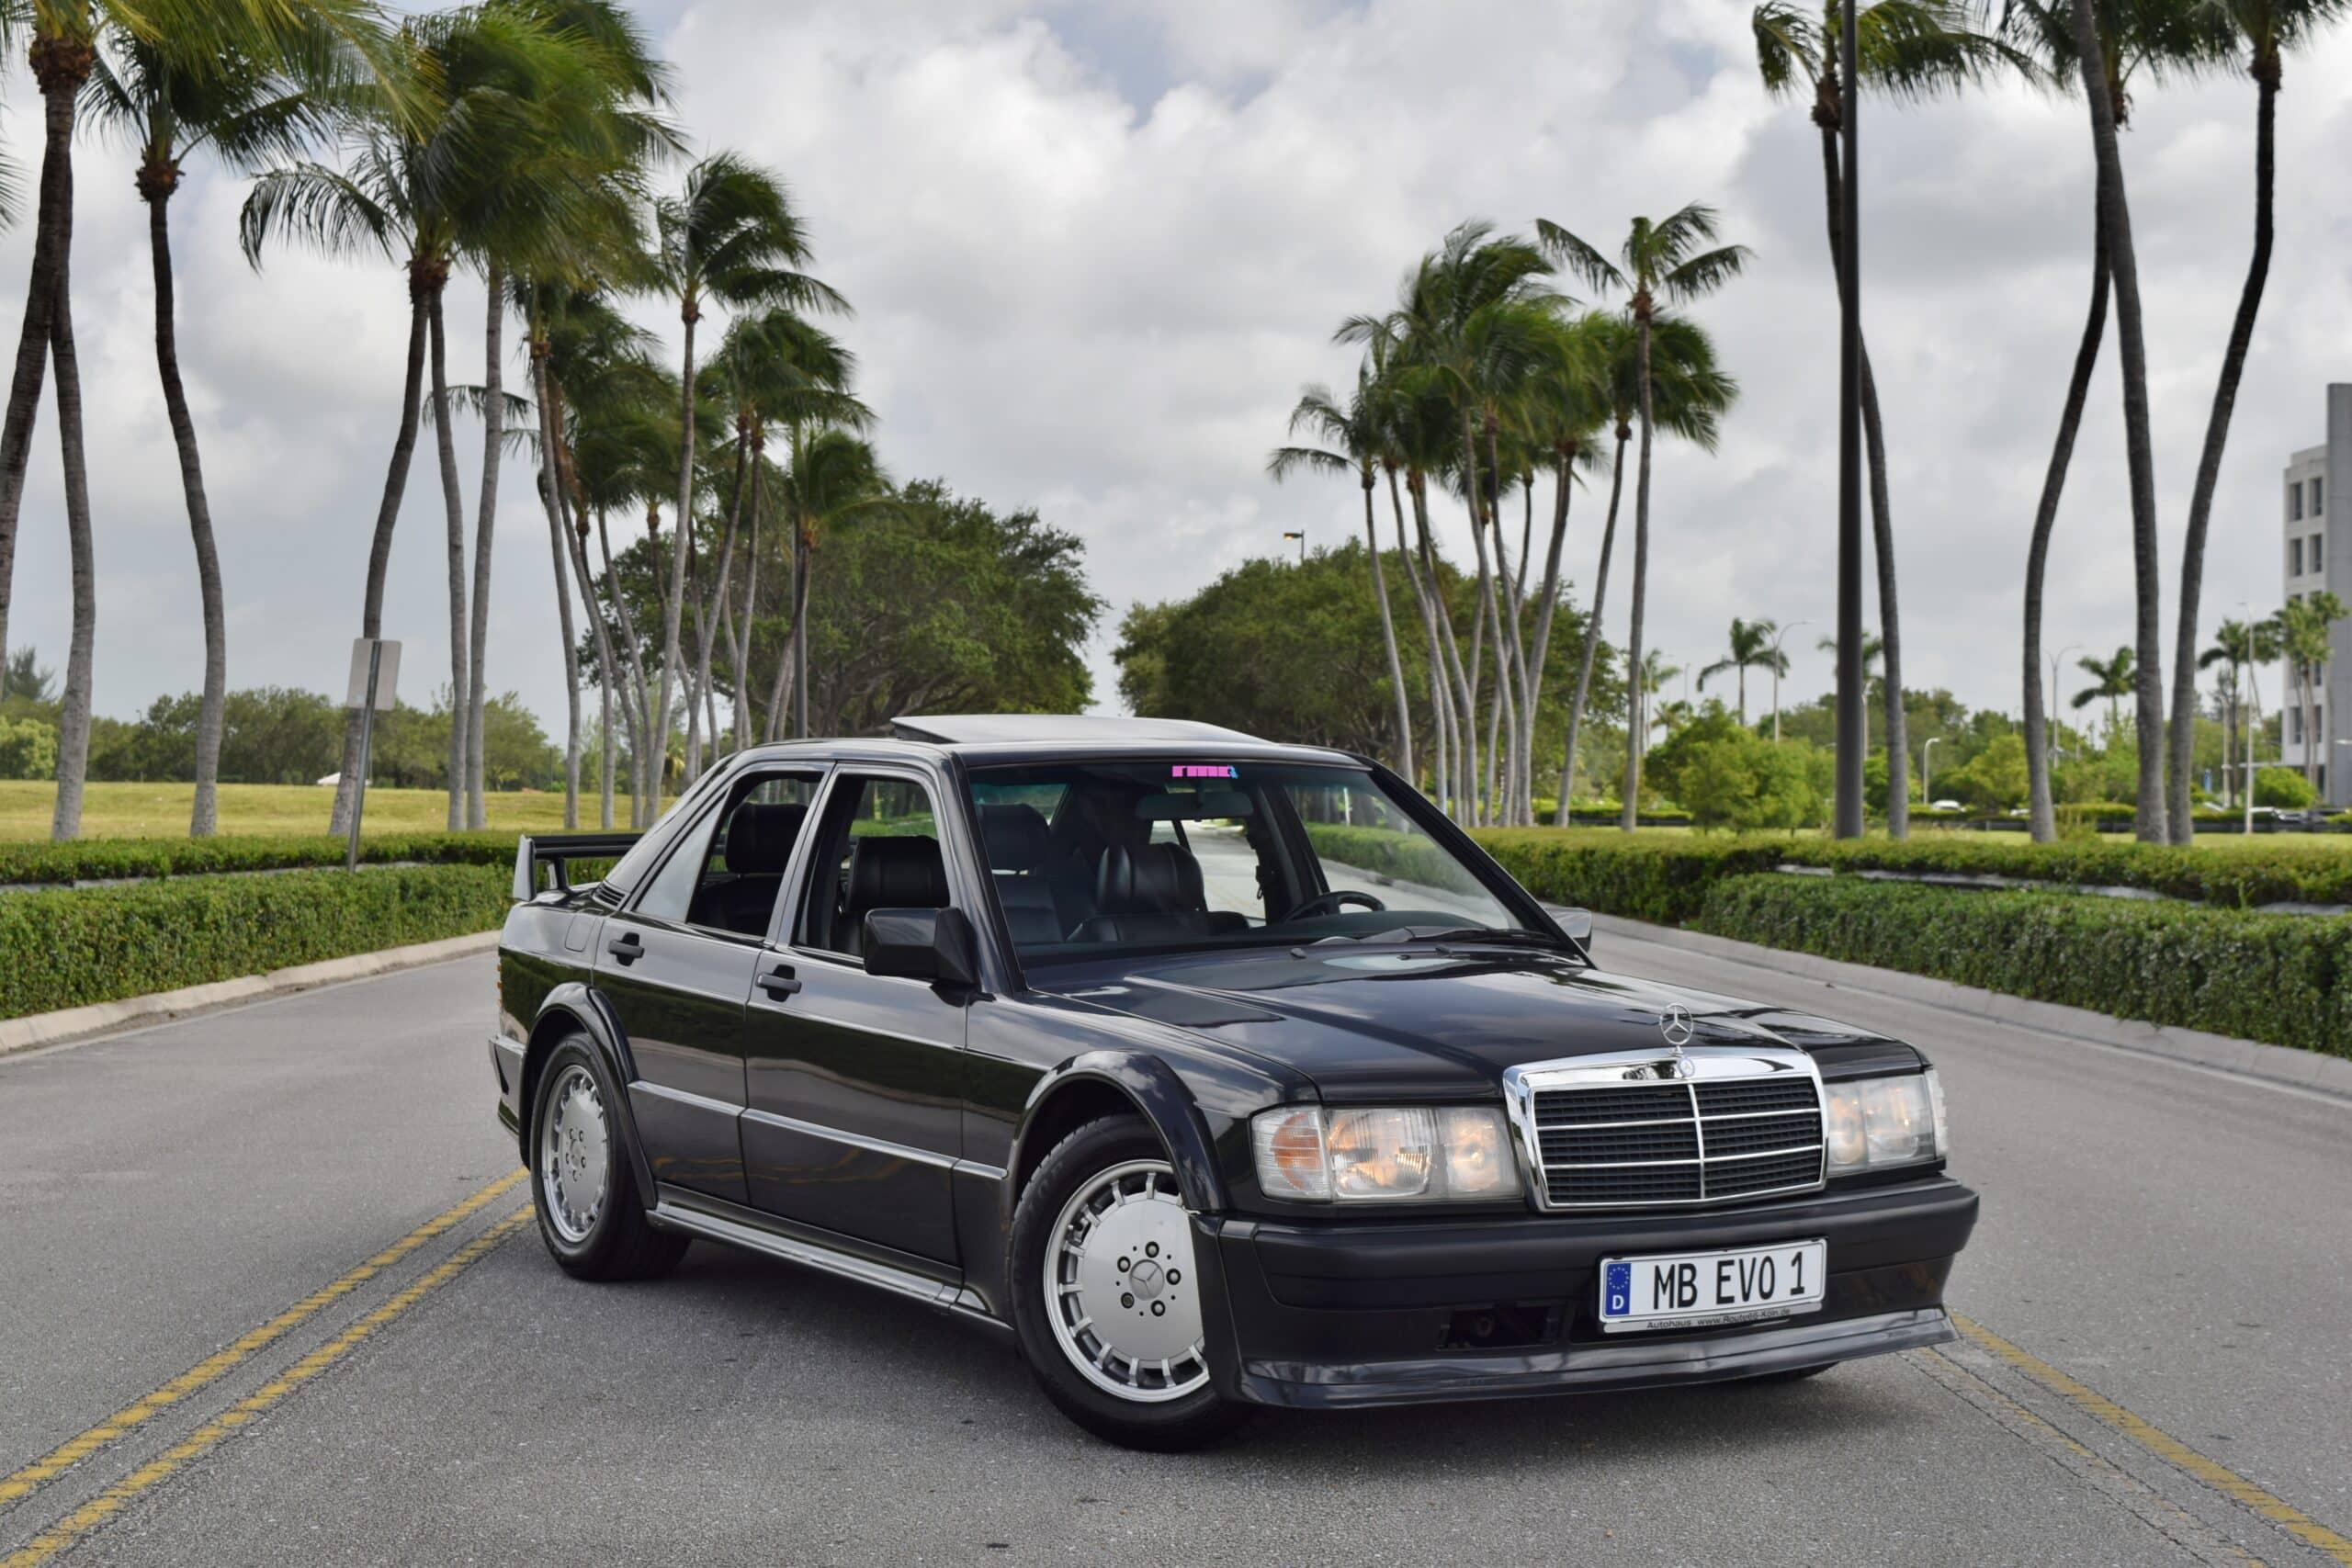 1989 Mercedes-Benz 190-Series EVOLUTION 1 1 of 502 Ever built HOMOLOGATION Car – 5 Speed Dogleg manual -Documented Service Book